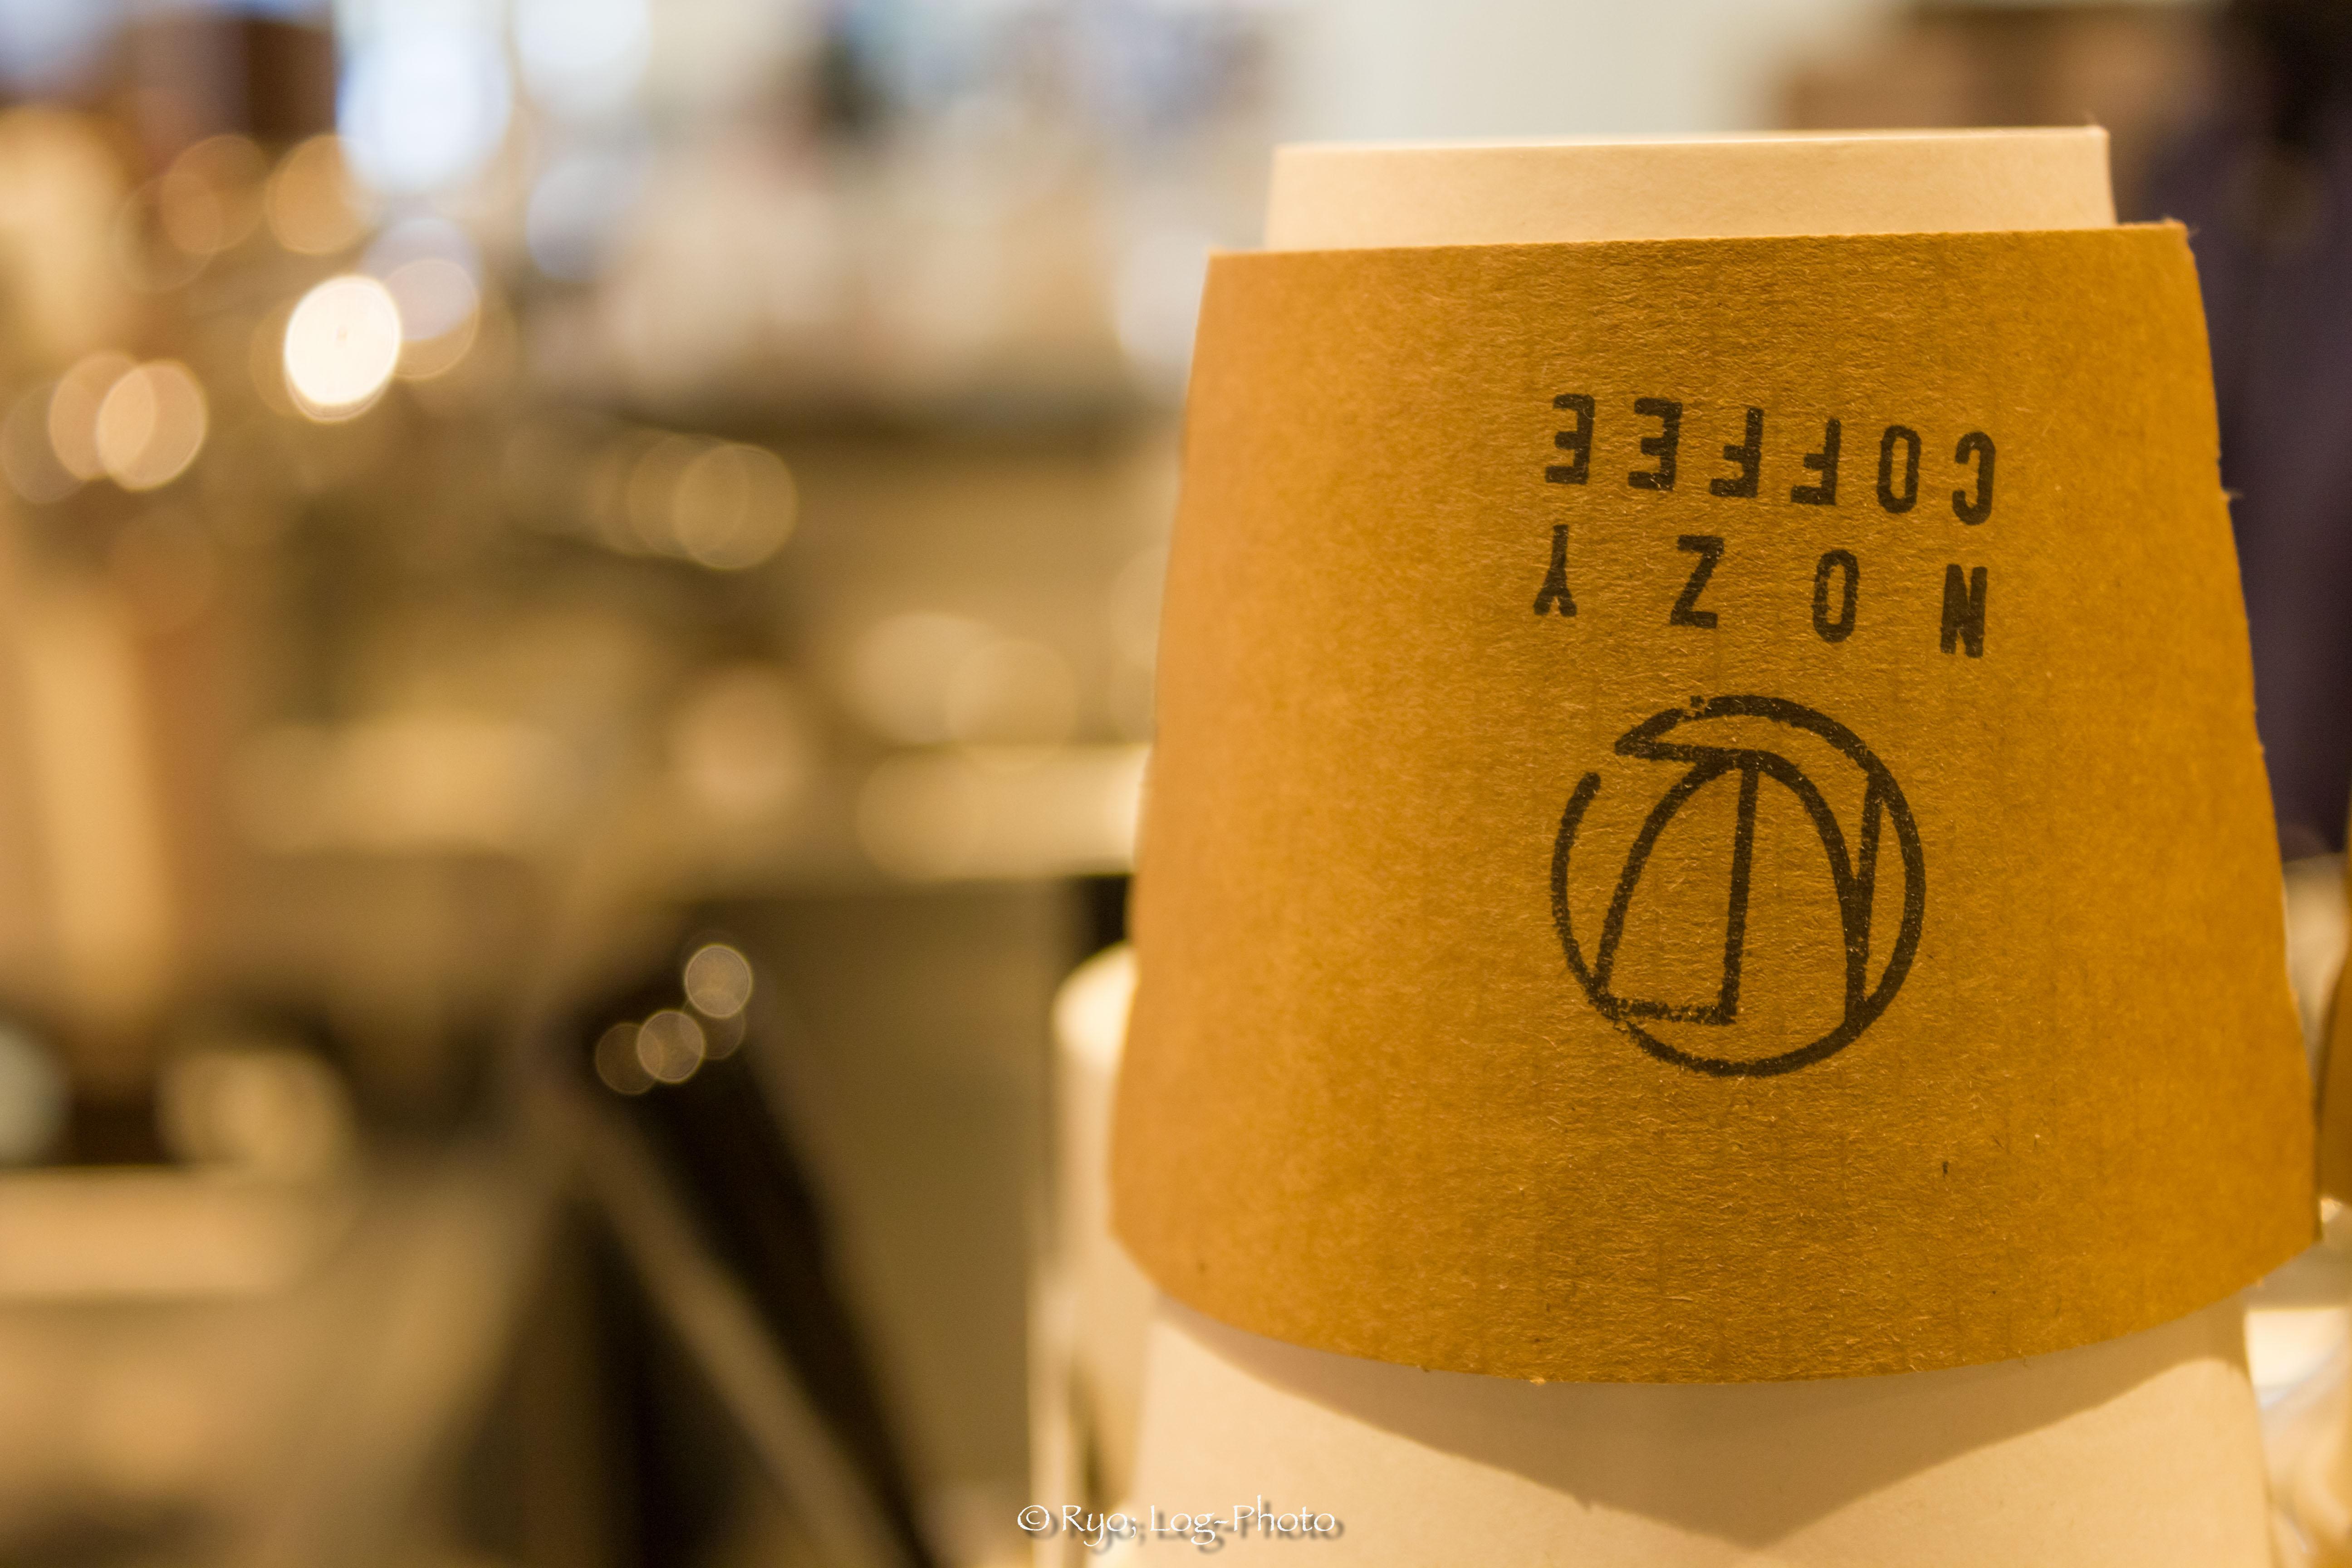 nozycoffee ノージーコーヒー 木更津 テイクアウト カフェ